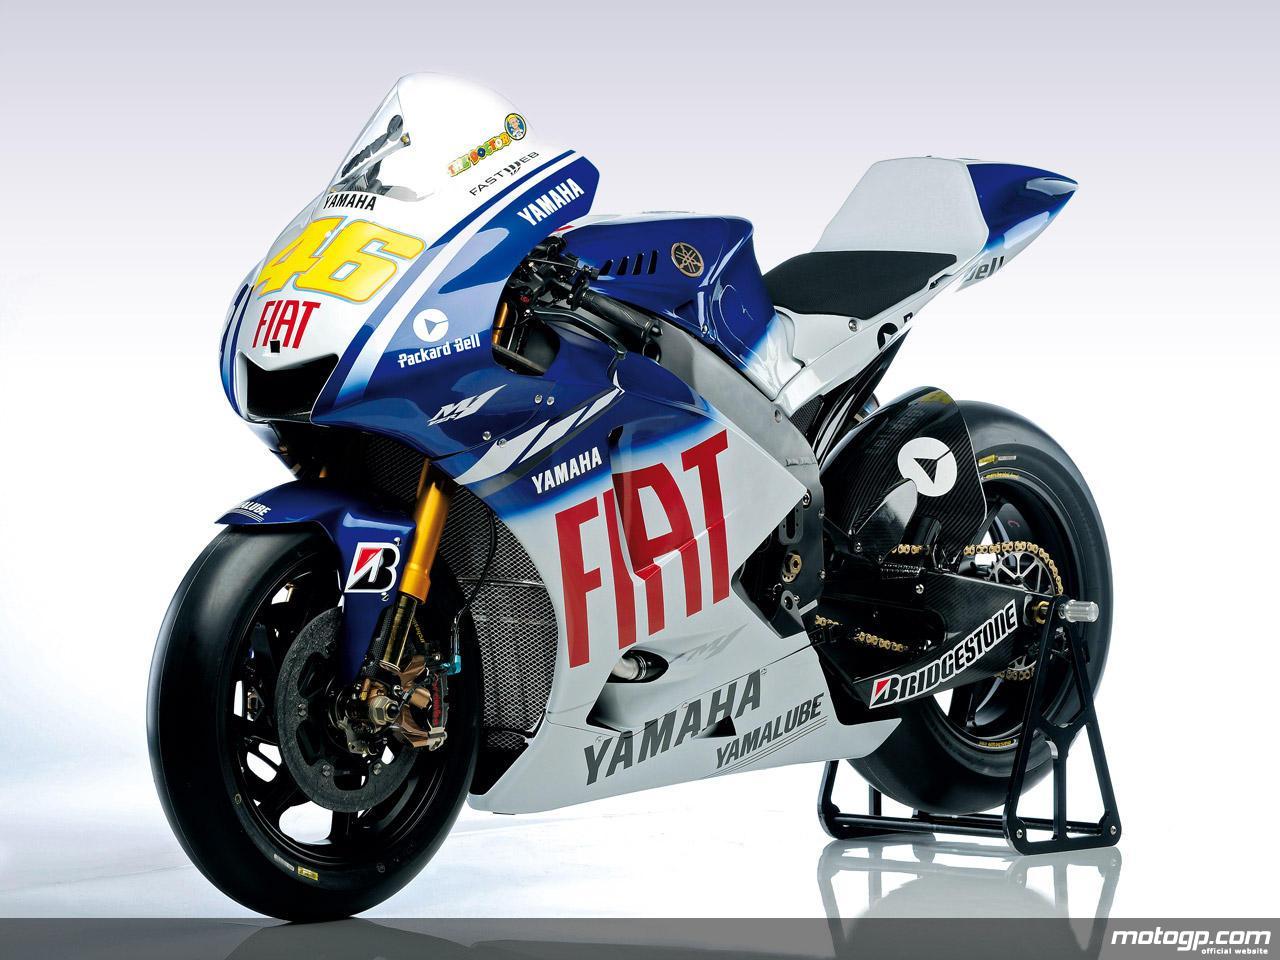 Modif Motor Yamaha F1